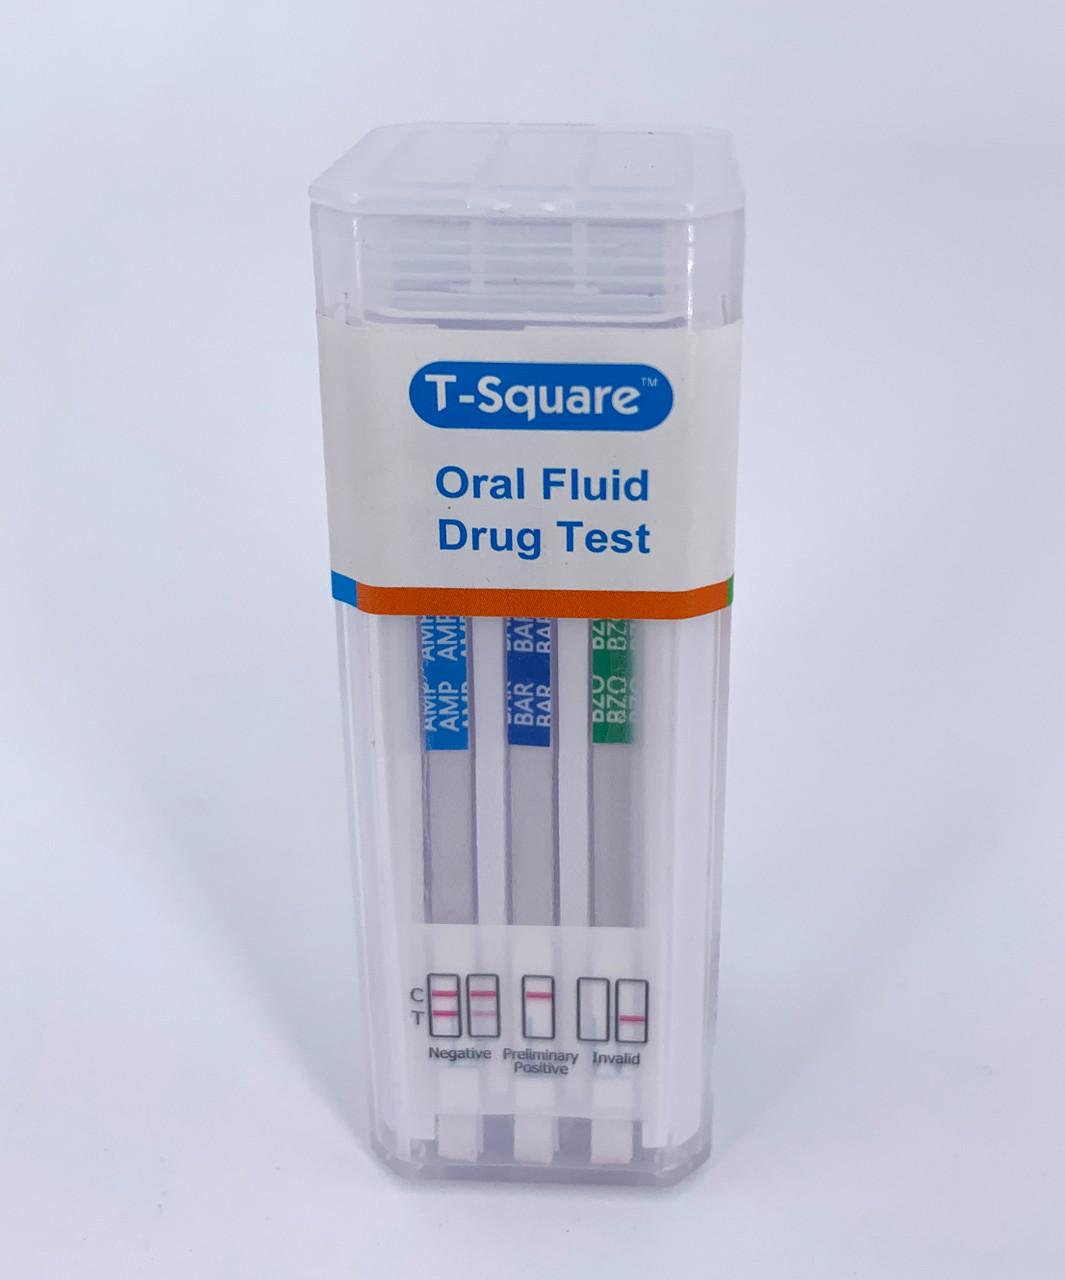 6 panel T-Square Saliva Drug Test Device